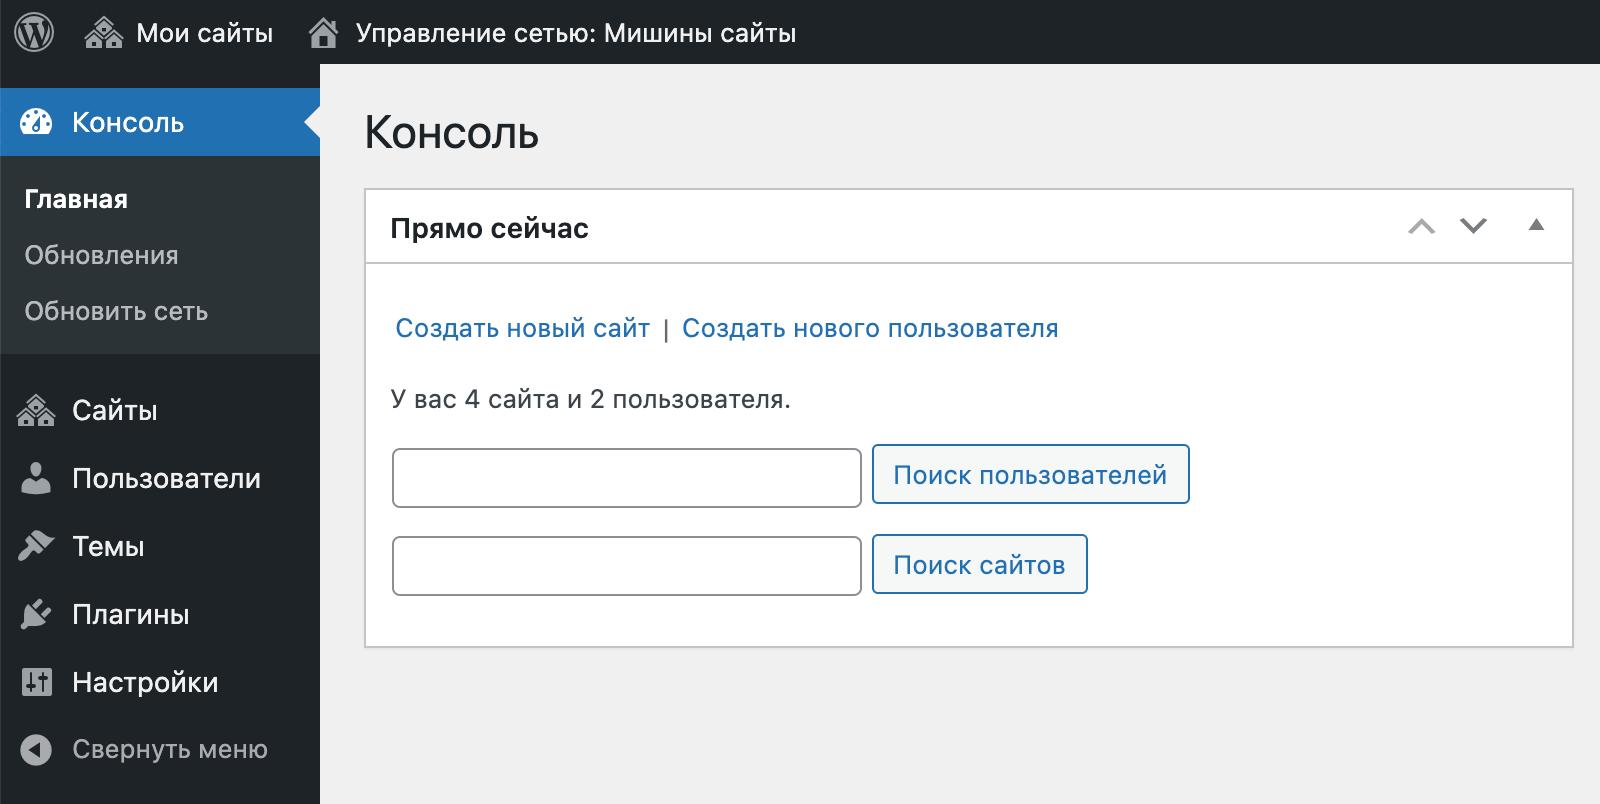 консоль WordPress Мультисайт для суперадминистраторов